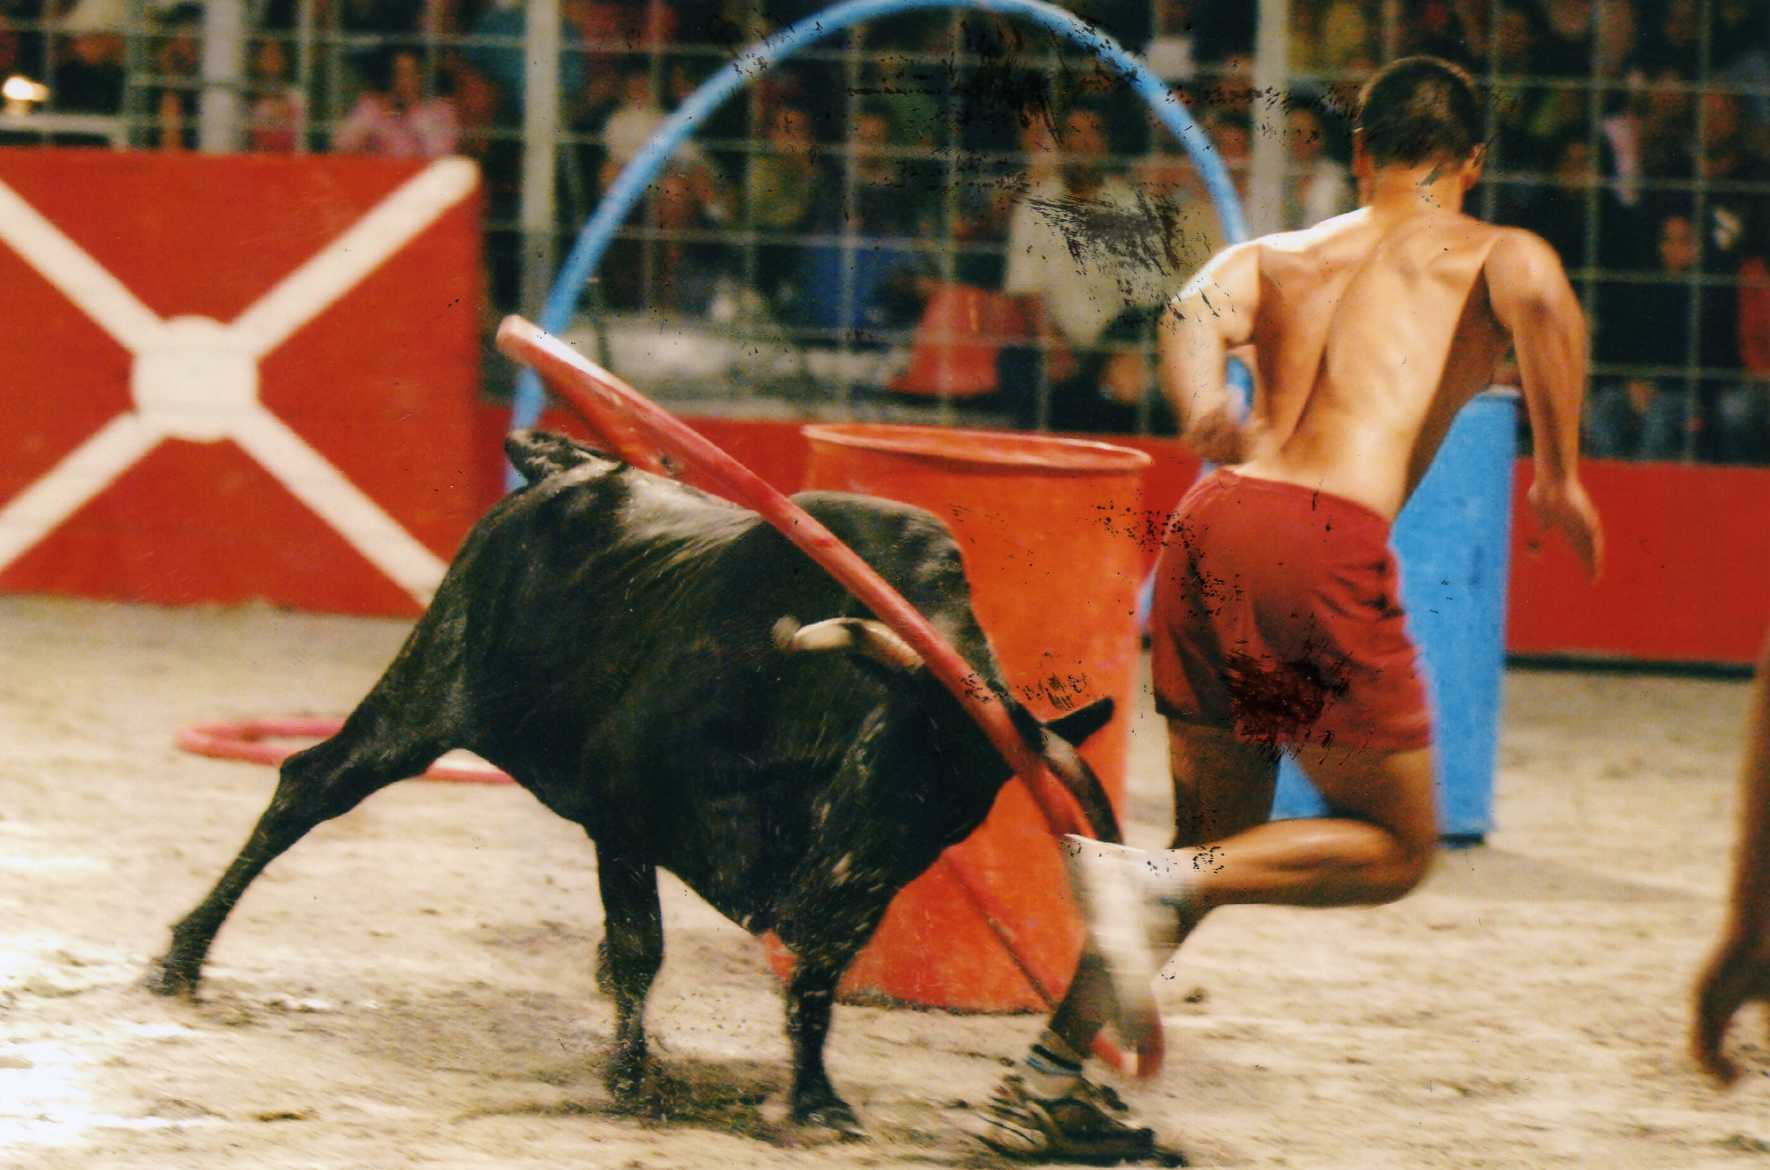 Spectacle Toro Piscine Labat À Messanges Le 09/08/2019 ... serapportantà Toro Piscine Labat